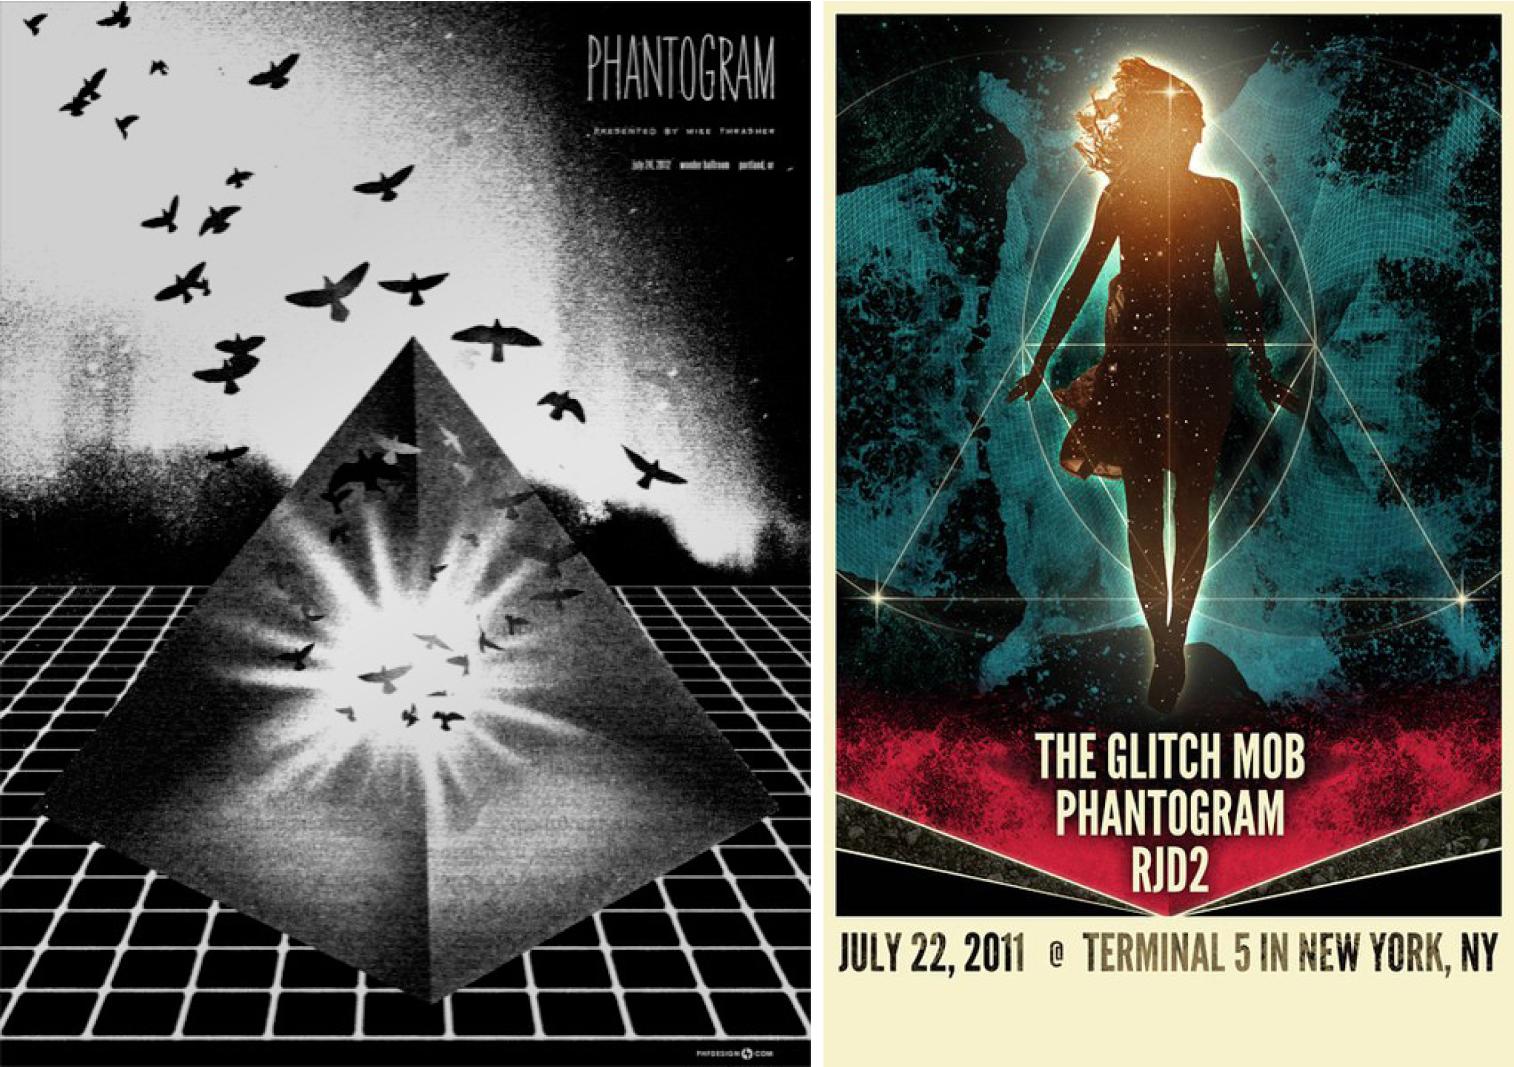 Phantogram - image 2 - student project